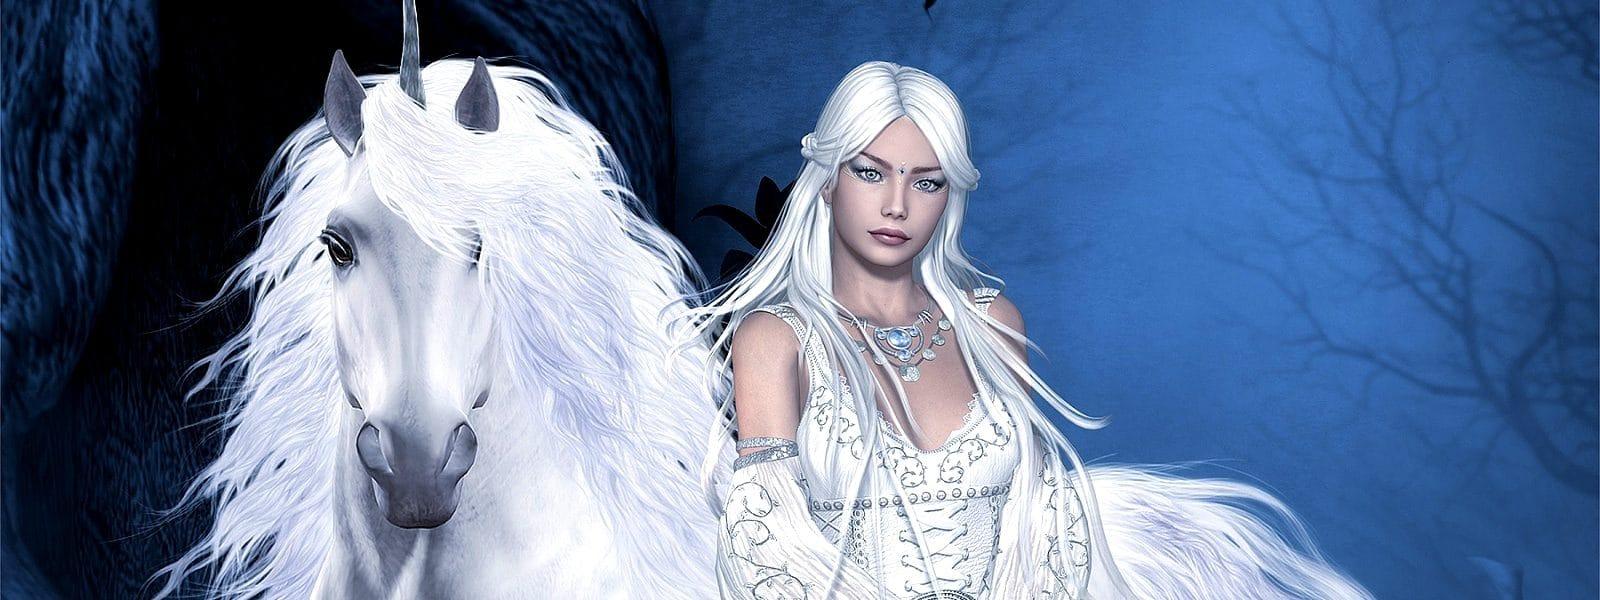 Licorne blanche avec une jeune fille vierge